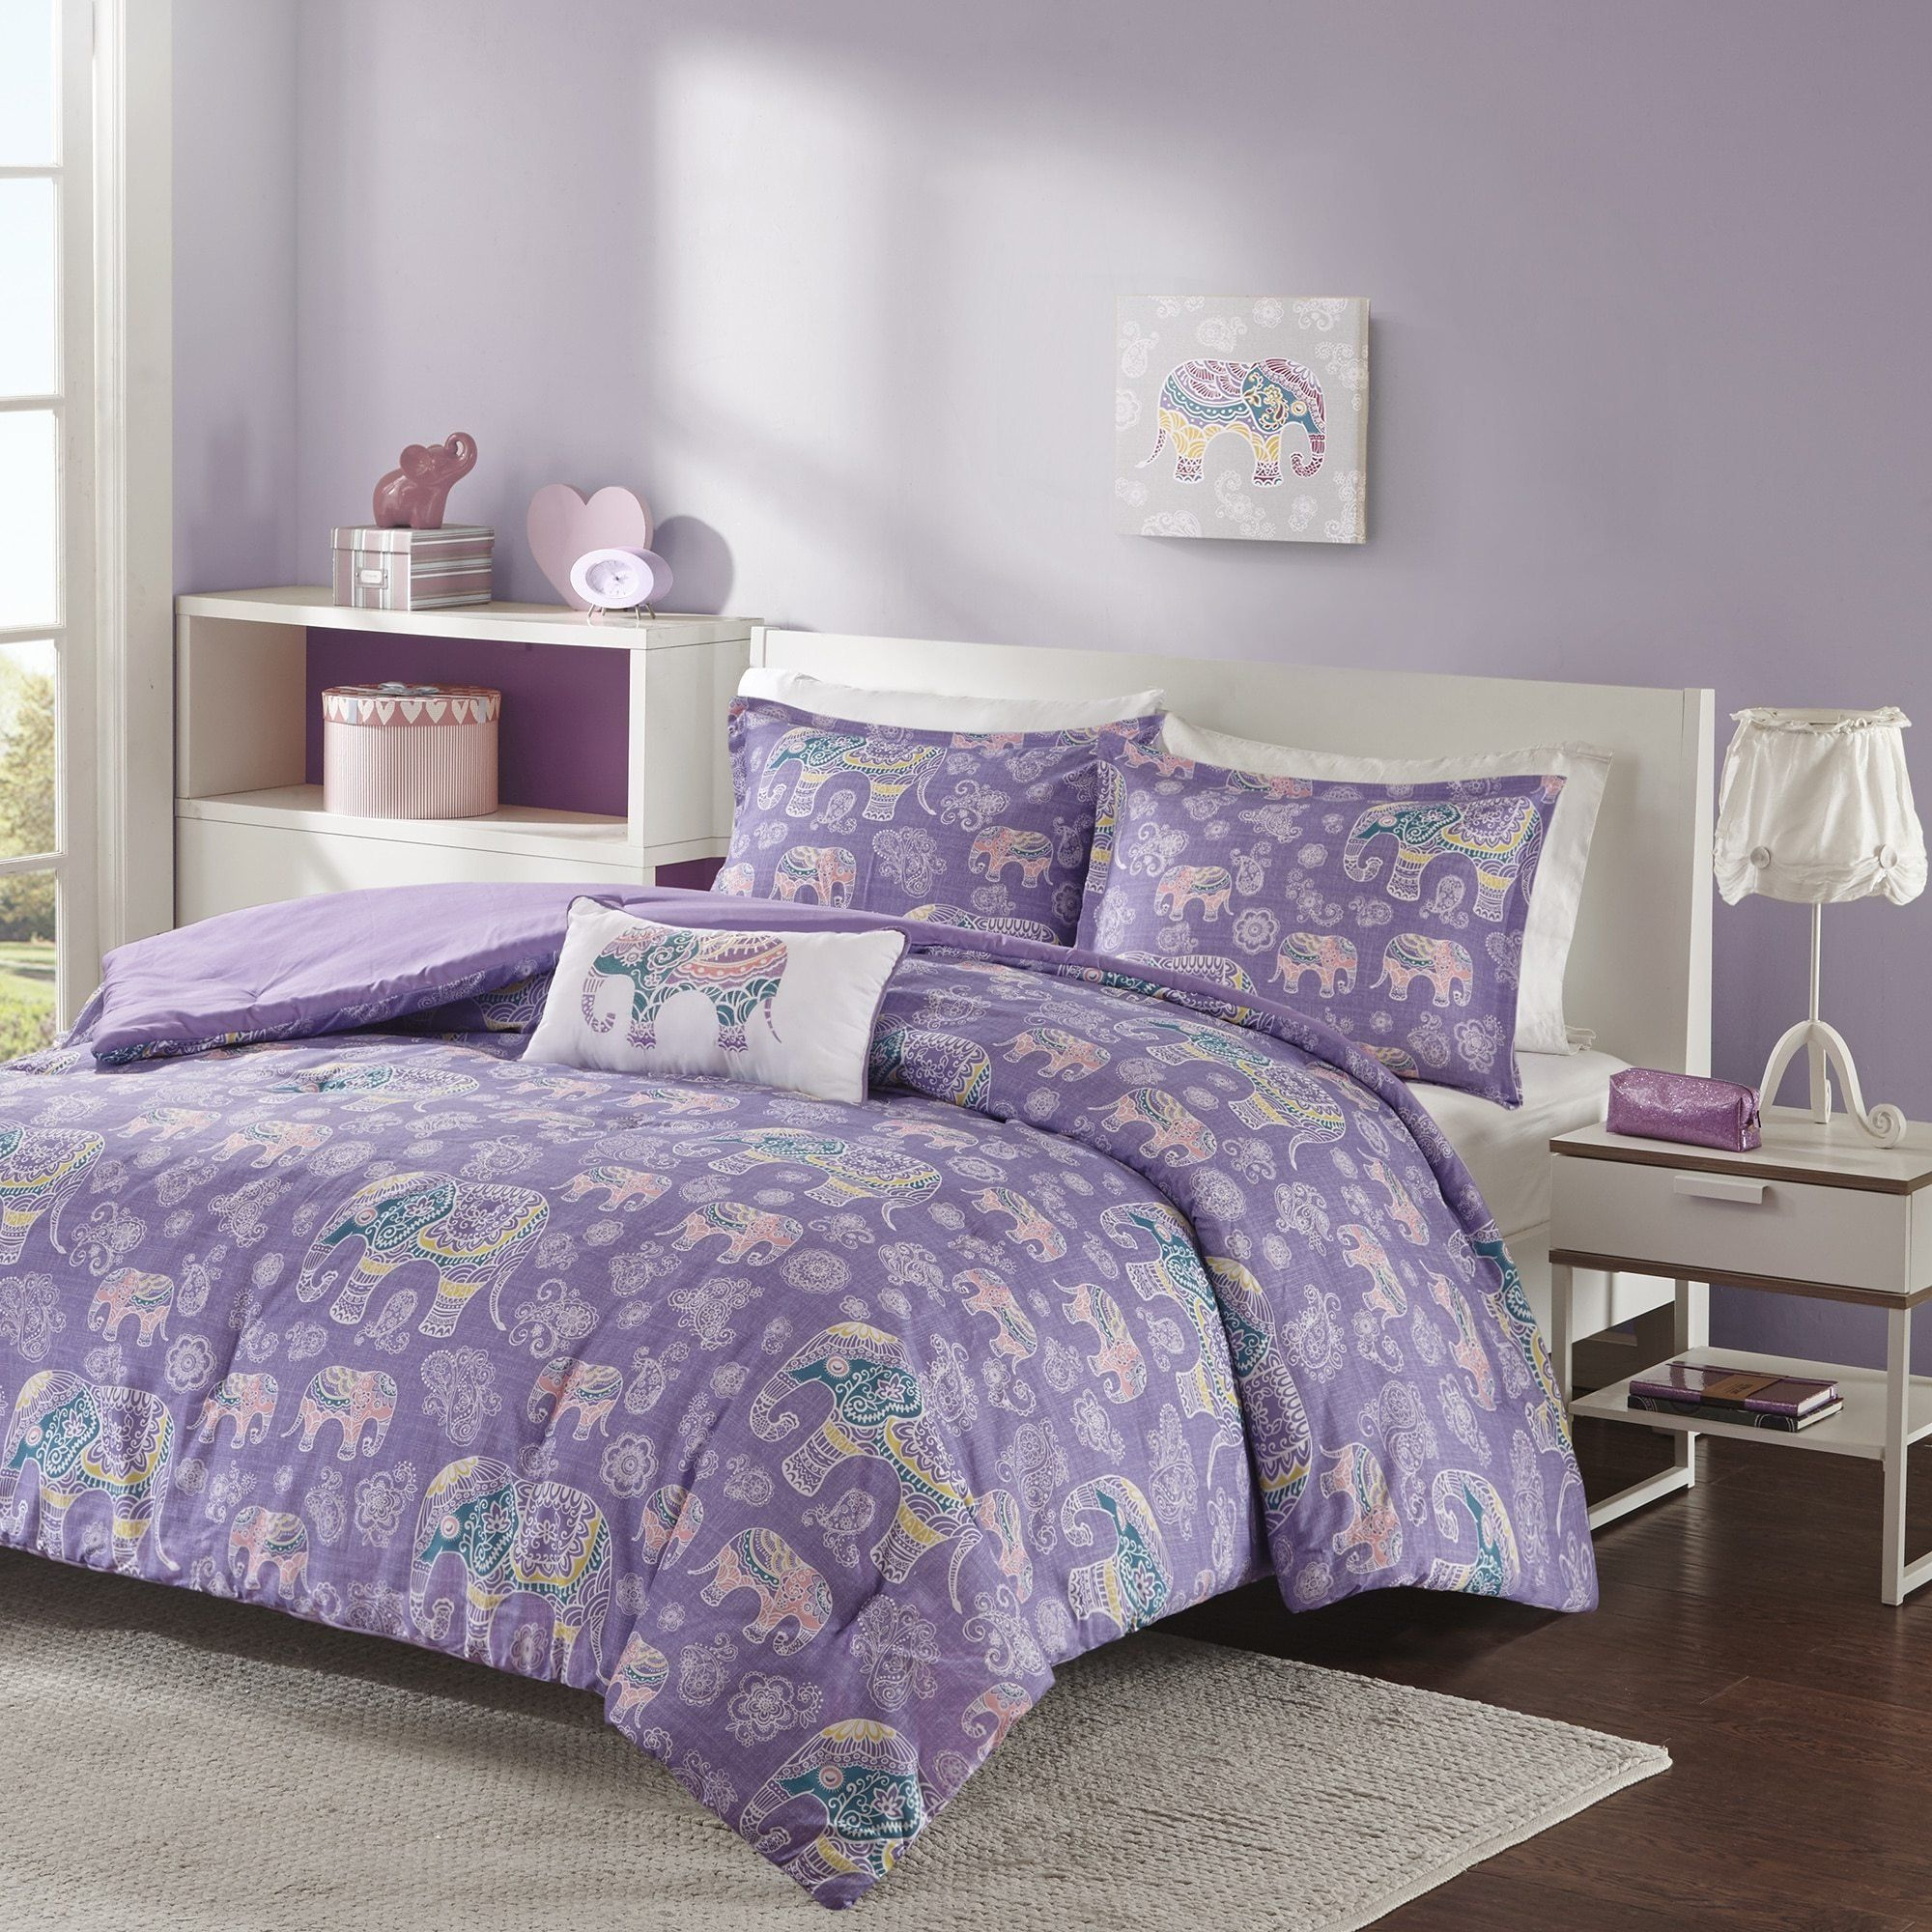 4 Piece Girls Light Purple Boho Chic Elephant Theme Comforter Full Queen Set Beautiful All Over Bohemian Paisley Fl Floral Bedding Twin Xl Comforter Comforters